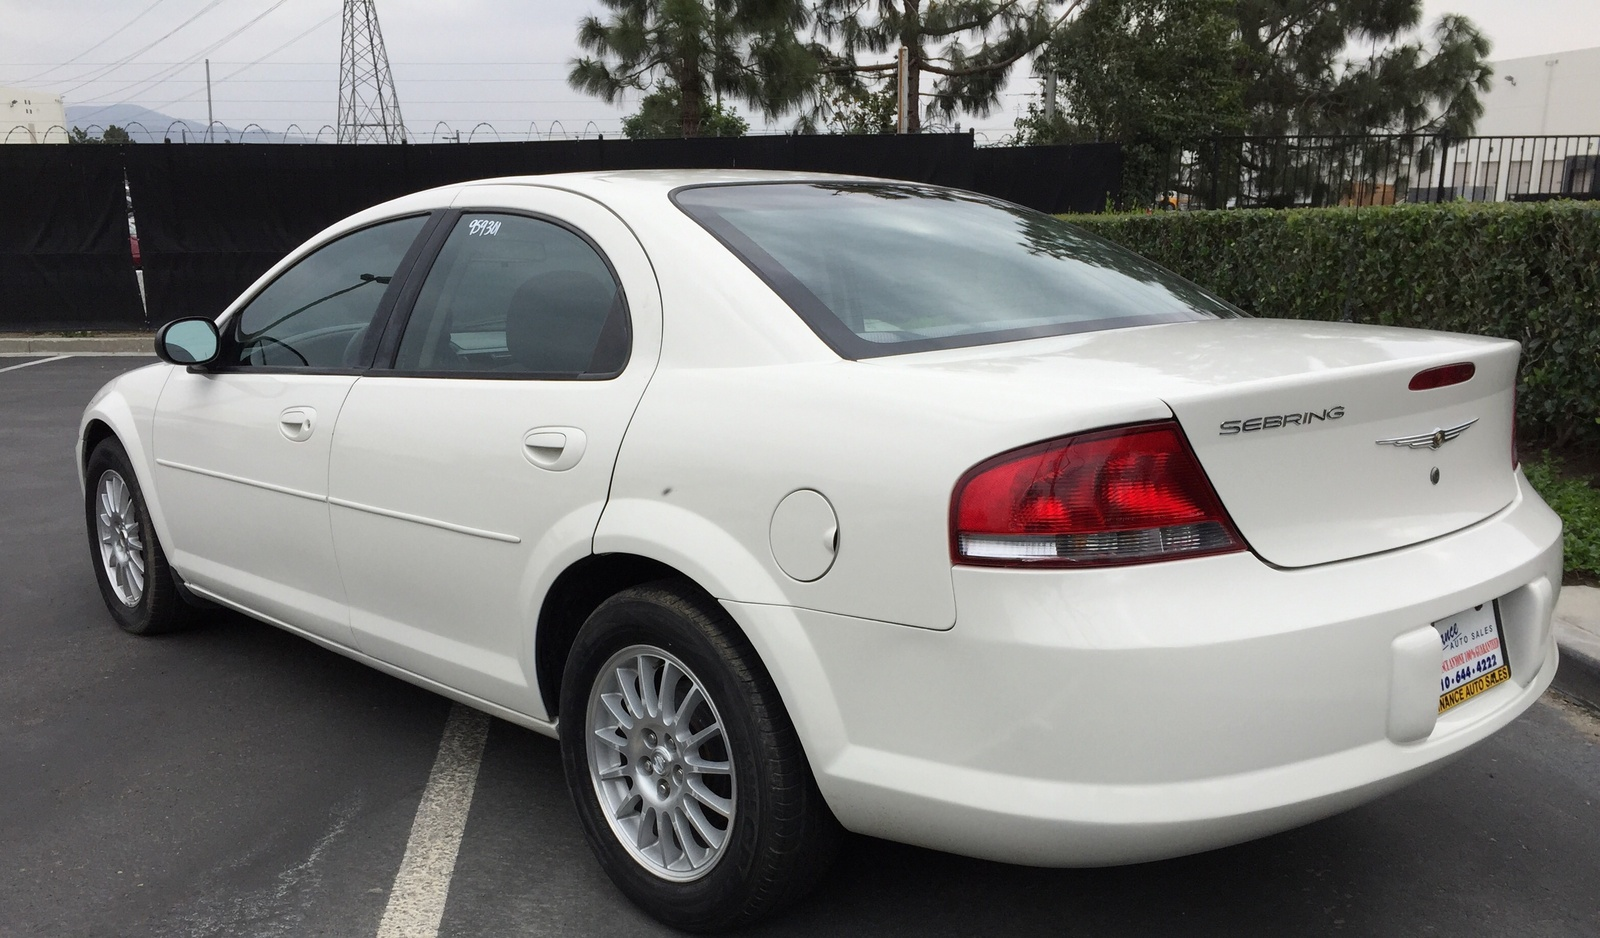 Picture of 2006 Chrysler Sebring Base